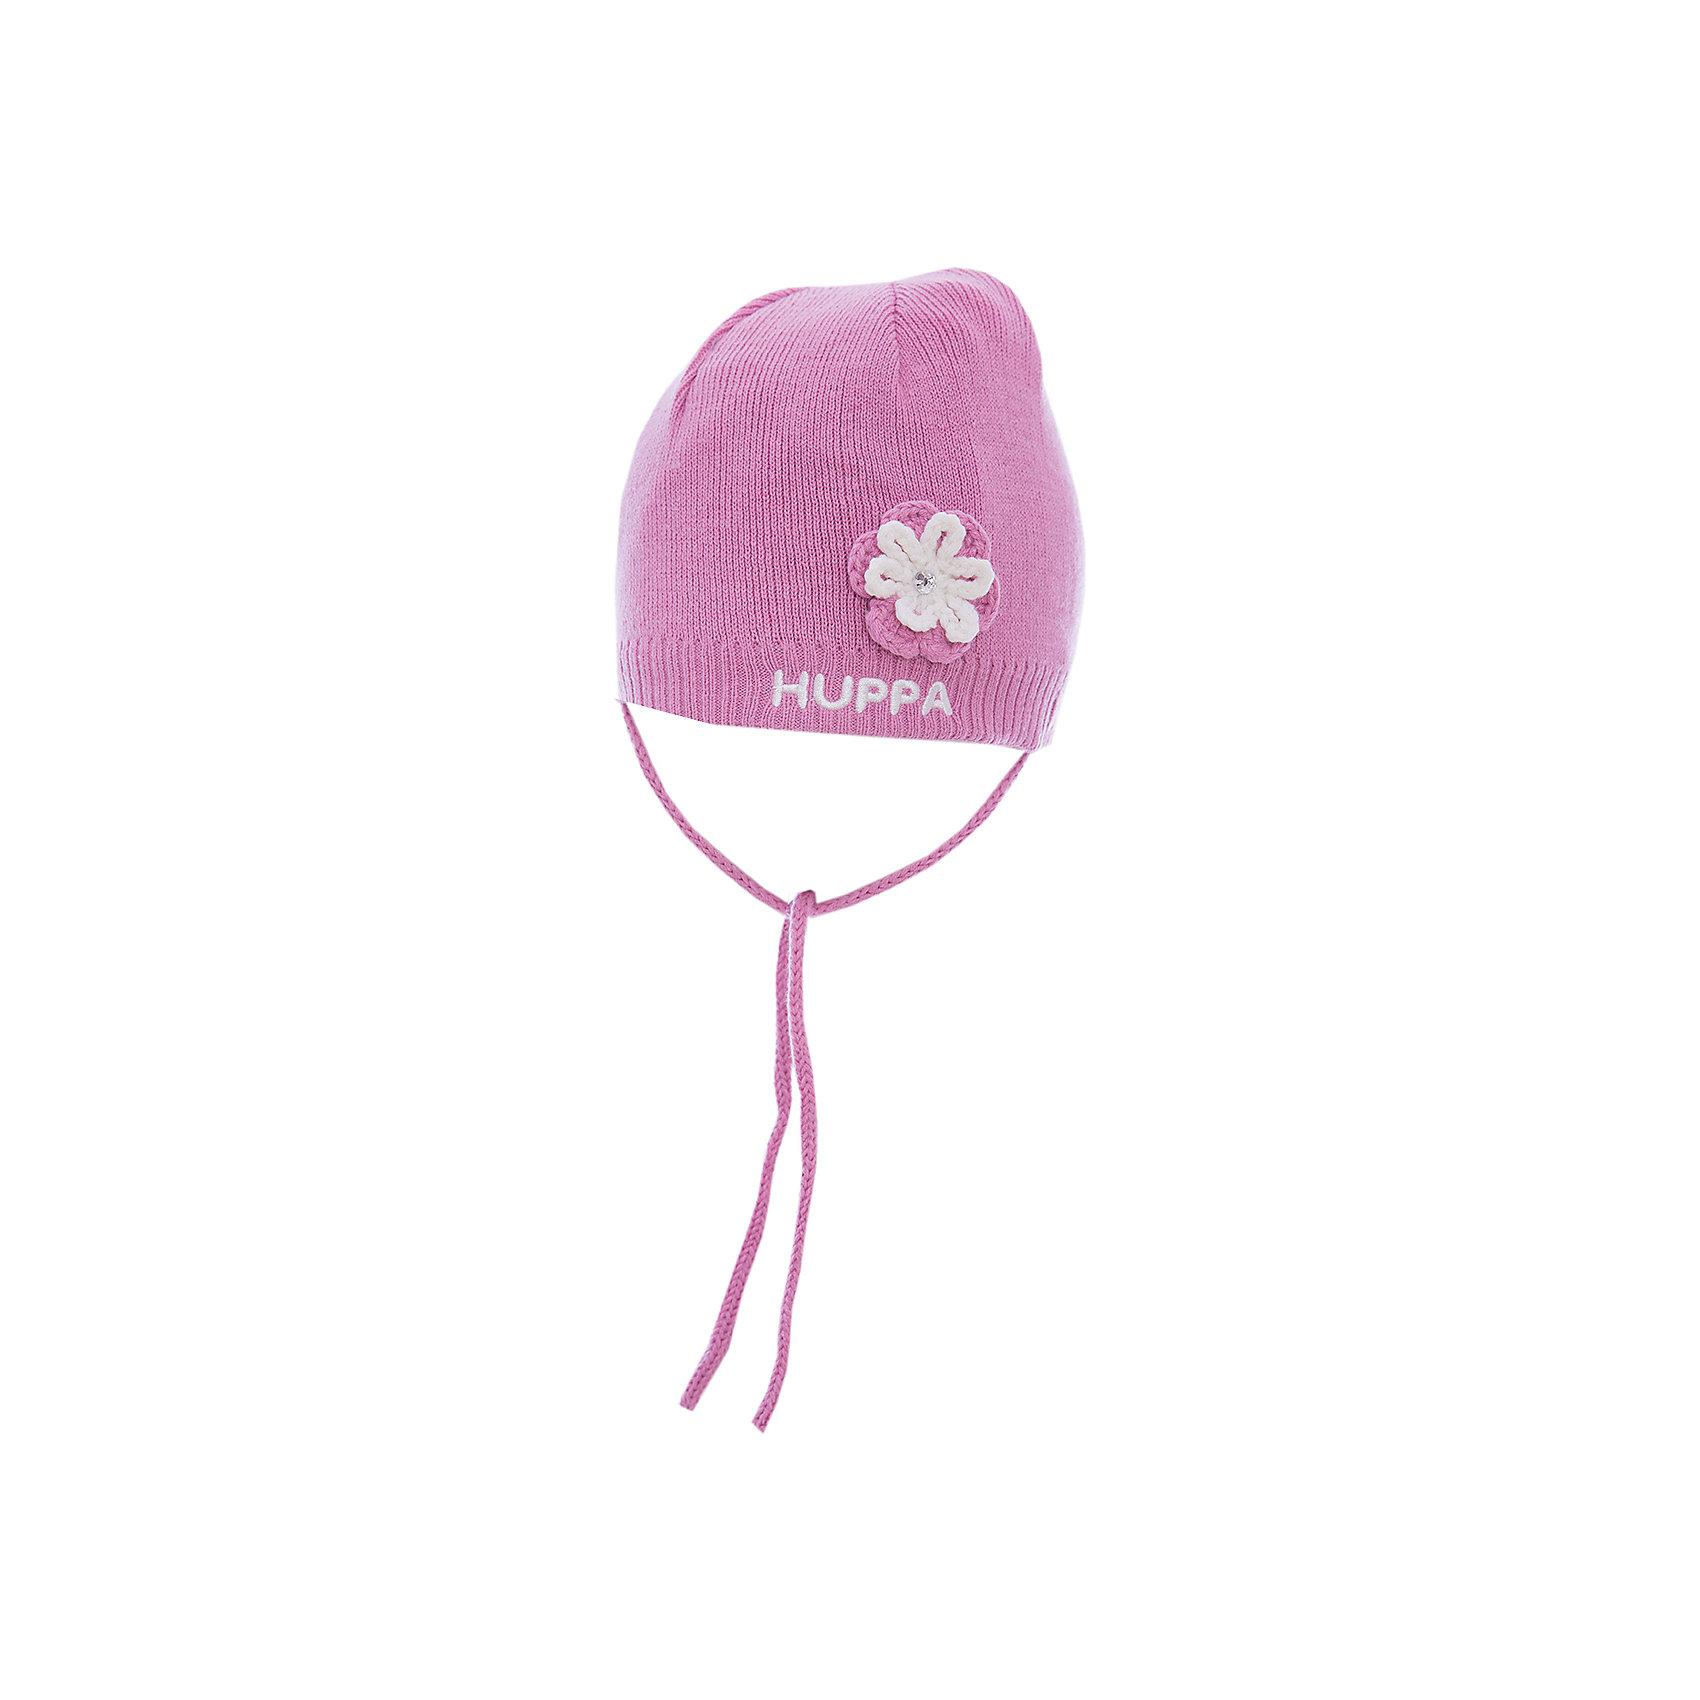 Huppa Шапка для девочки Huppa color kids демисезонная для девочки flandern розовая